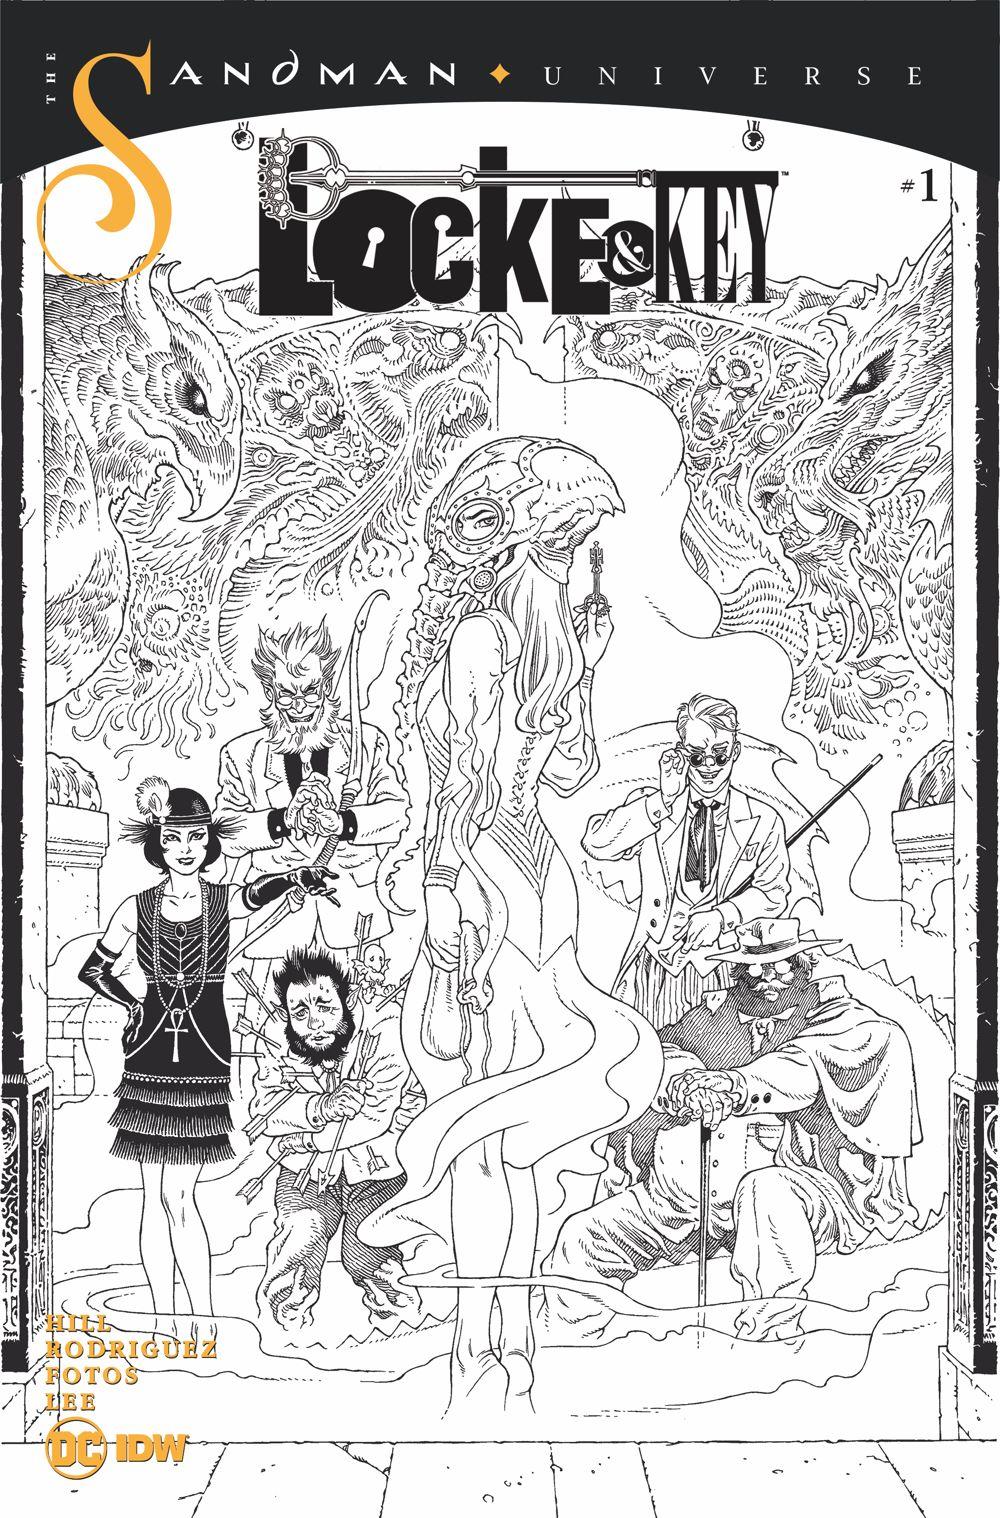 LnK-Sandma-4 ComicList Previews: LOCKE AND KEY THE SANDMAN UNIVERSE HELL AND GONE #1